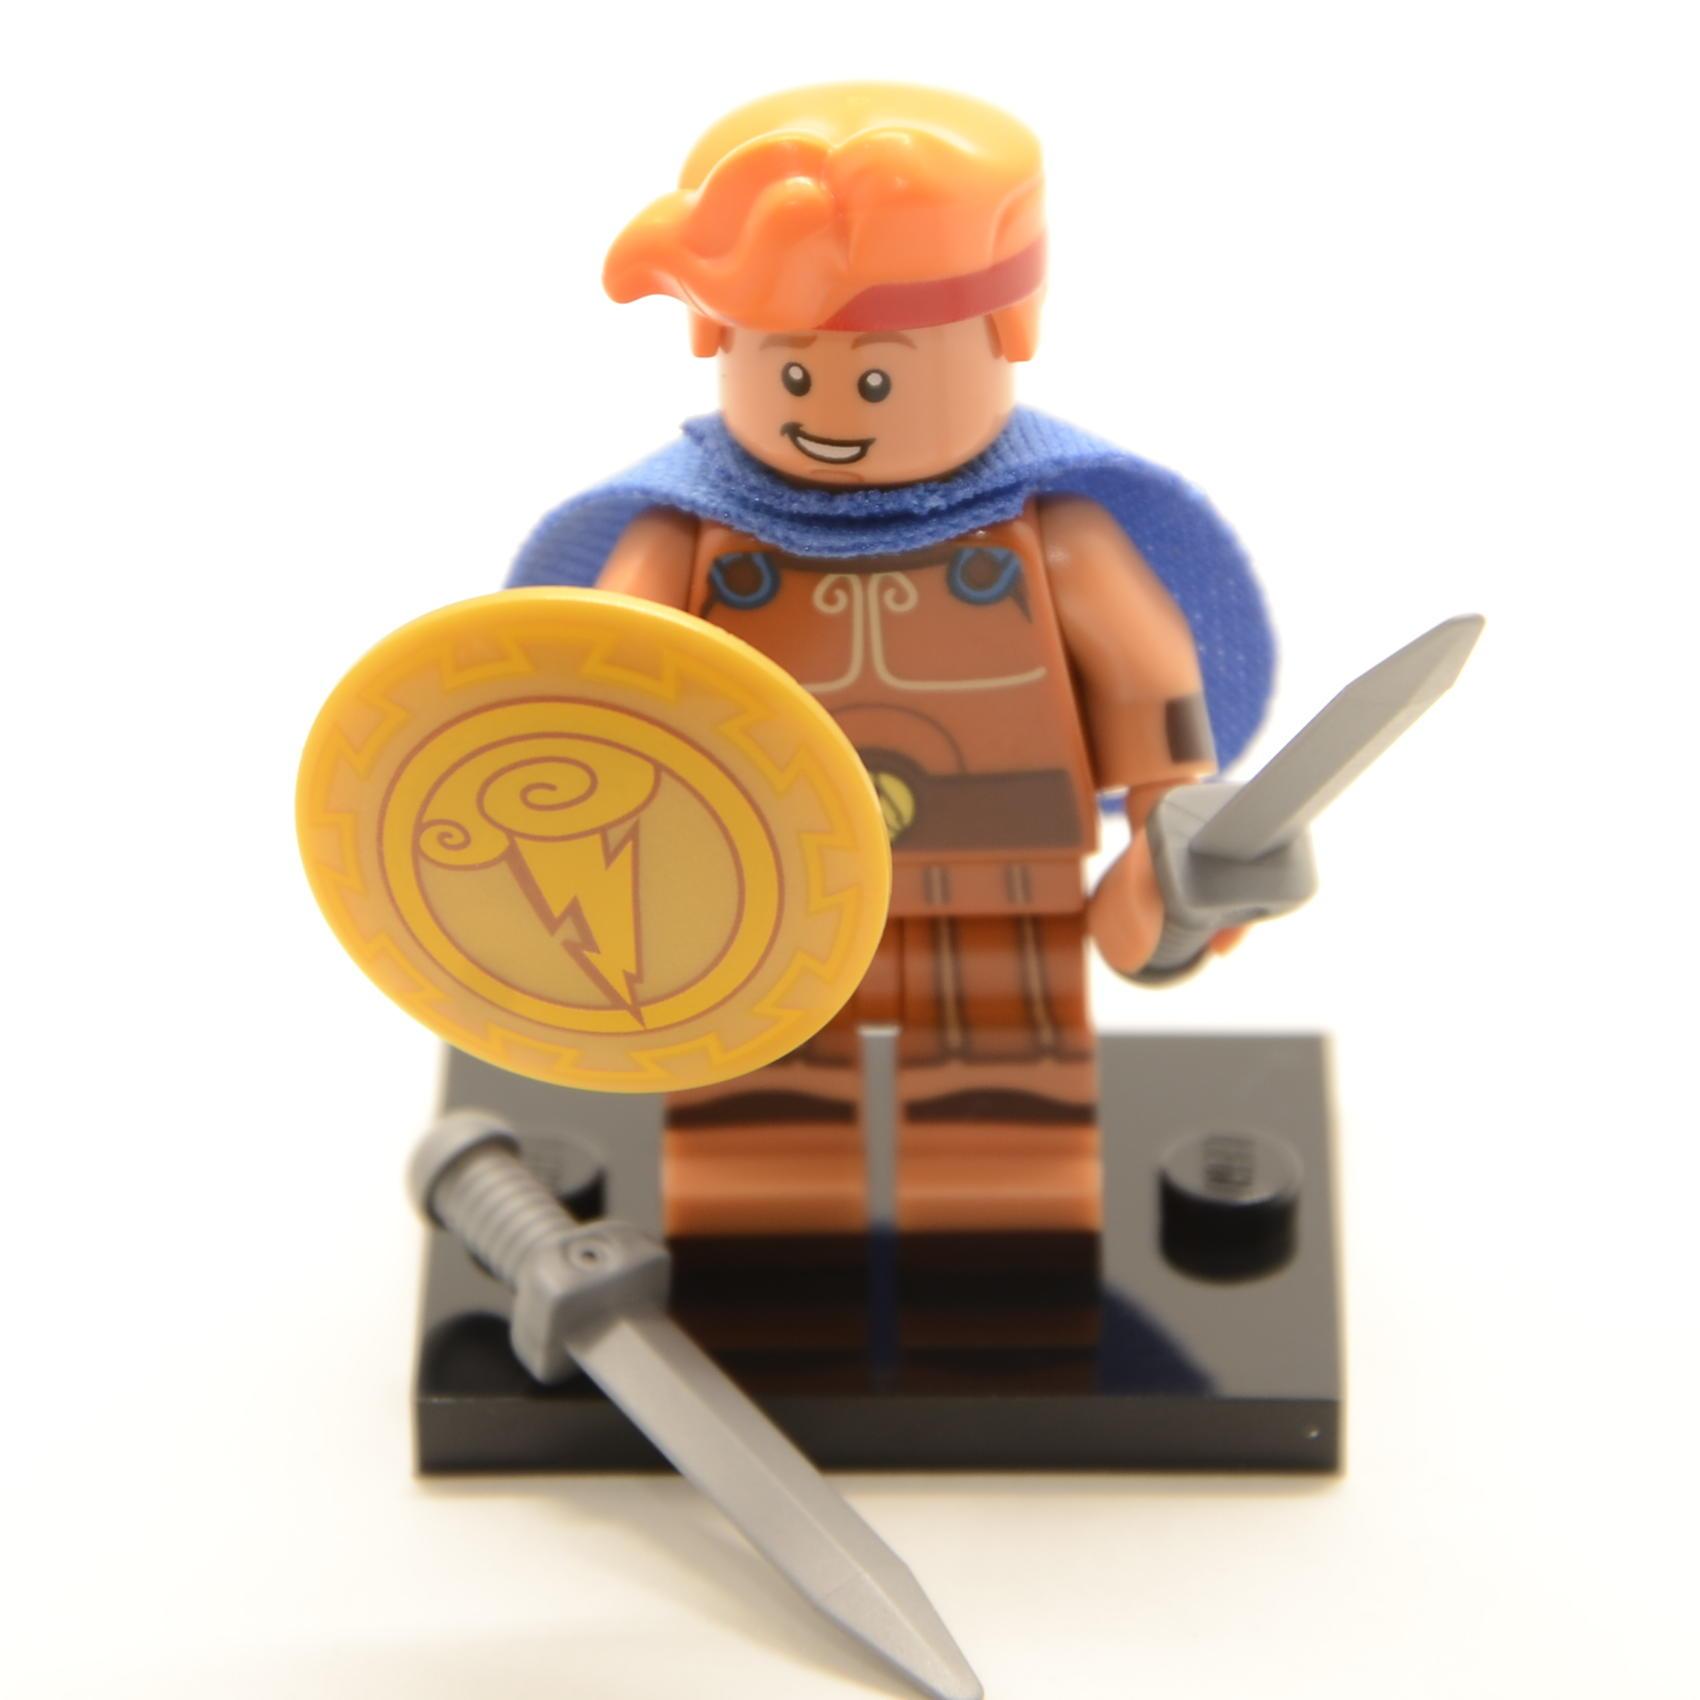 LEGO-minifigures-the-disney-series-2-hercules